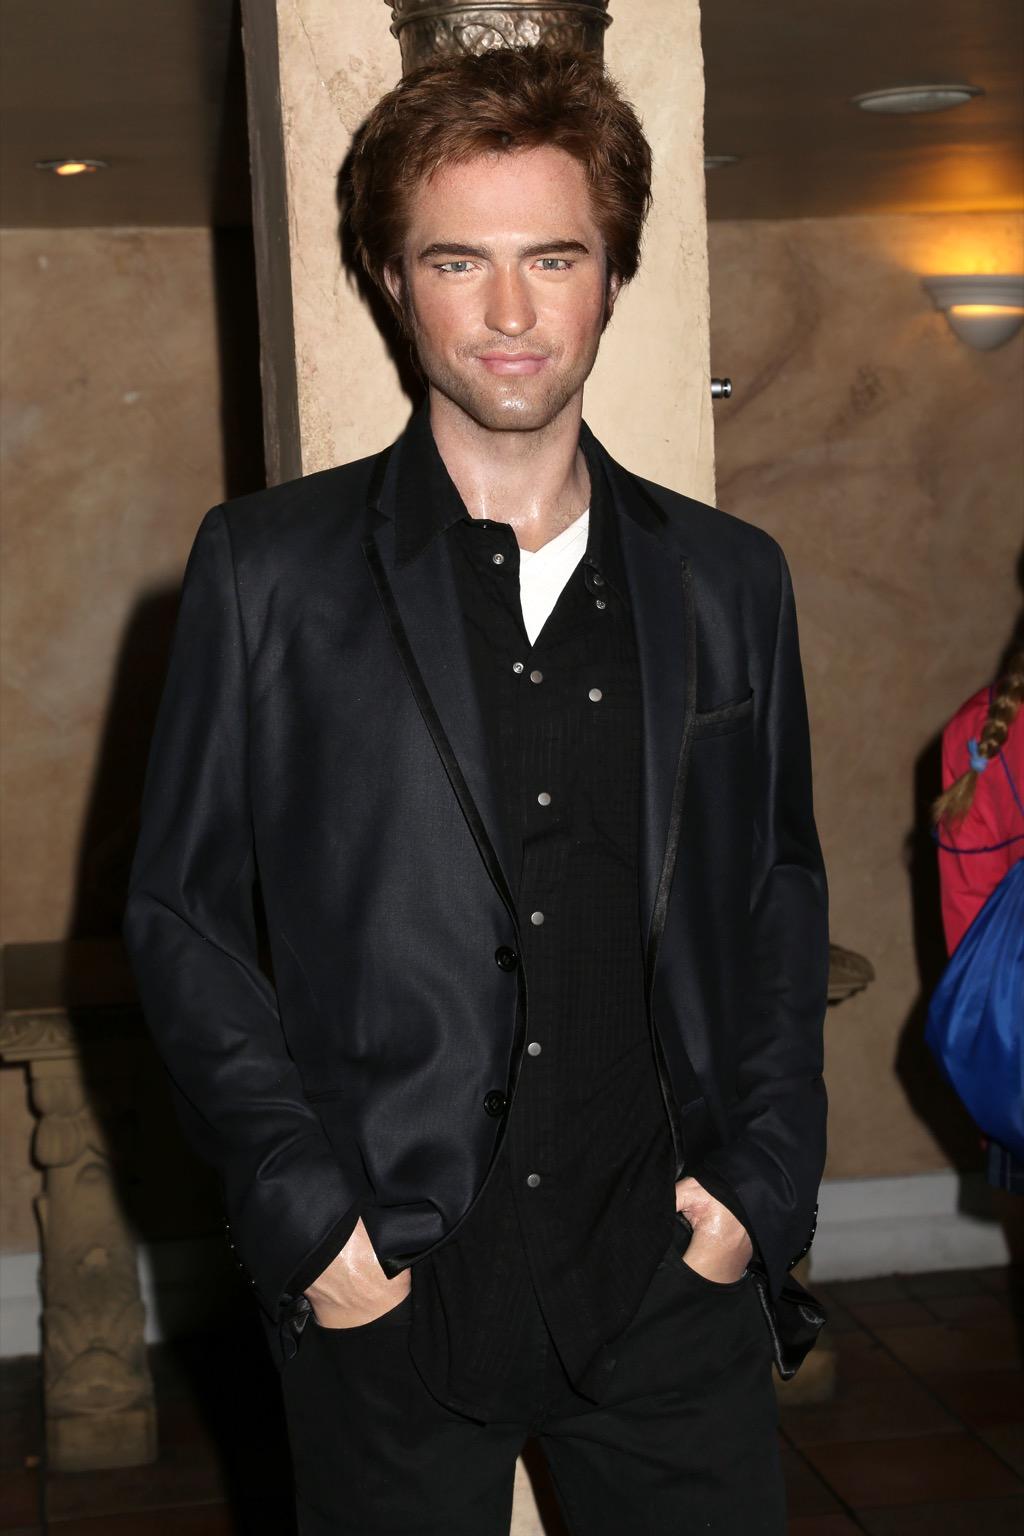 Robert Pattinson Madame Tussauds